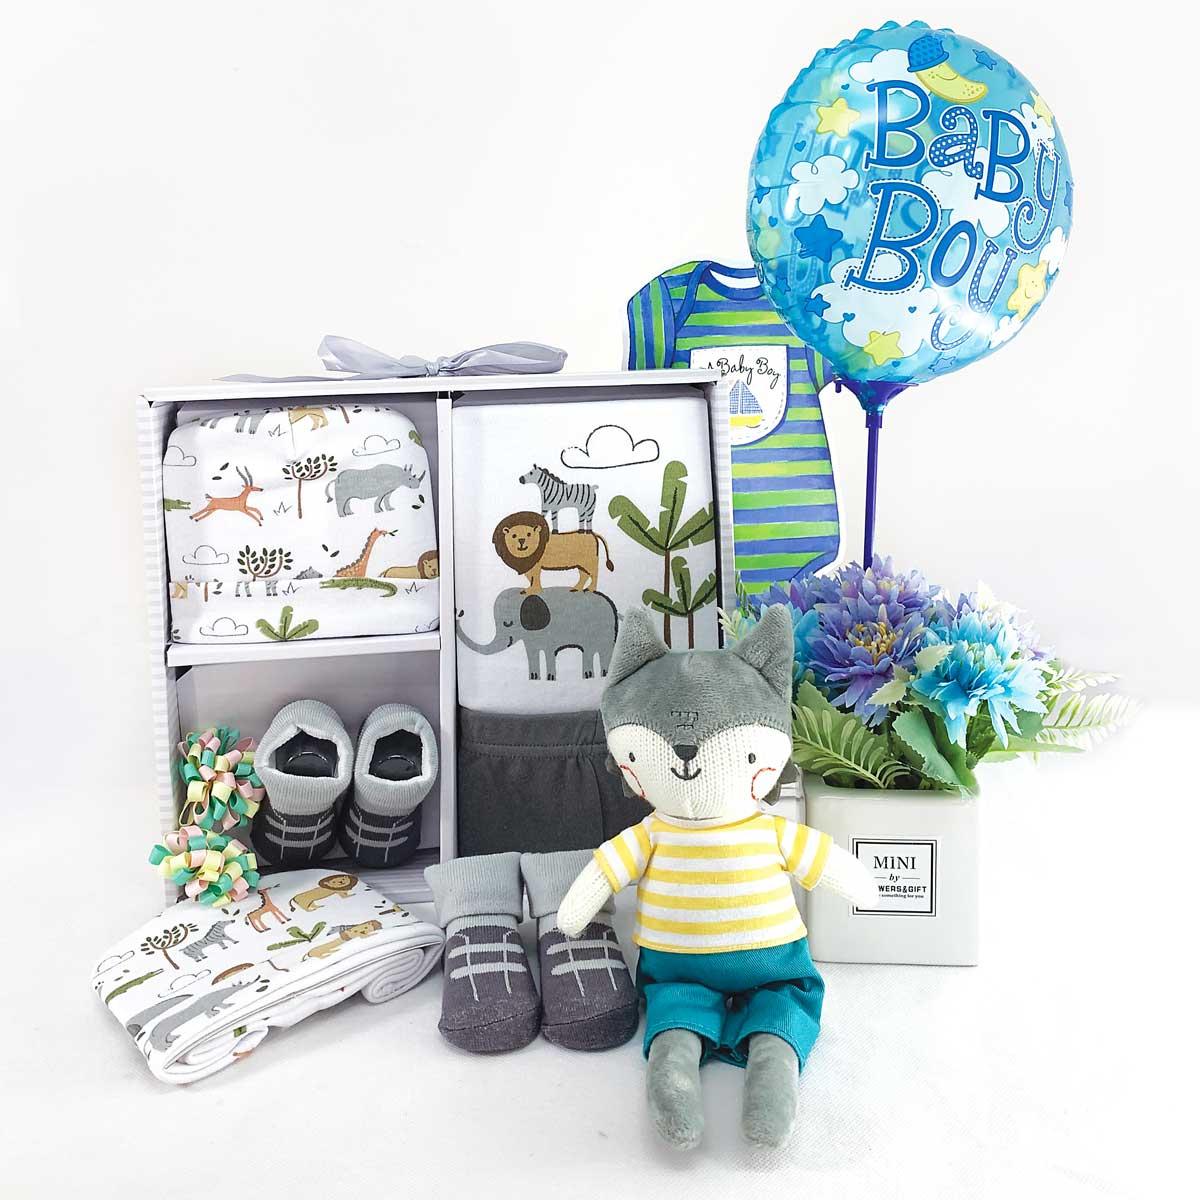 Prince Kingdom   Newborn Baby Gifts   Eska Creative Gifting